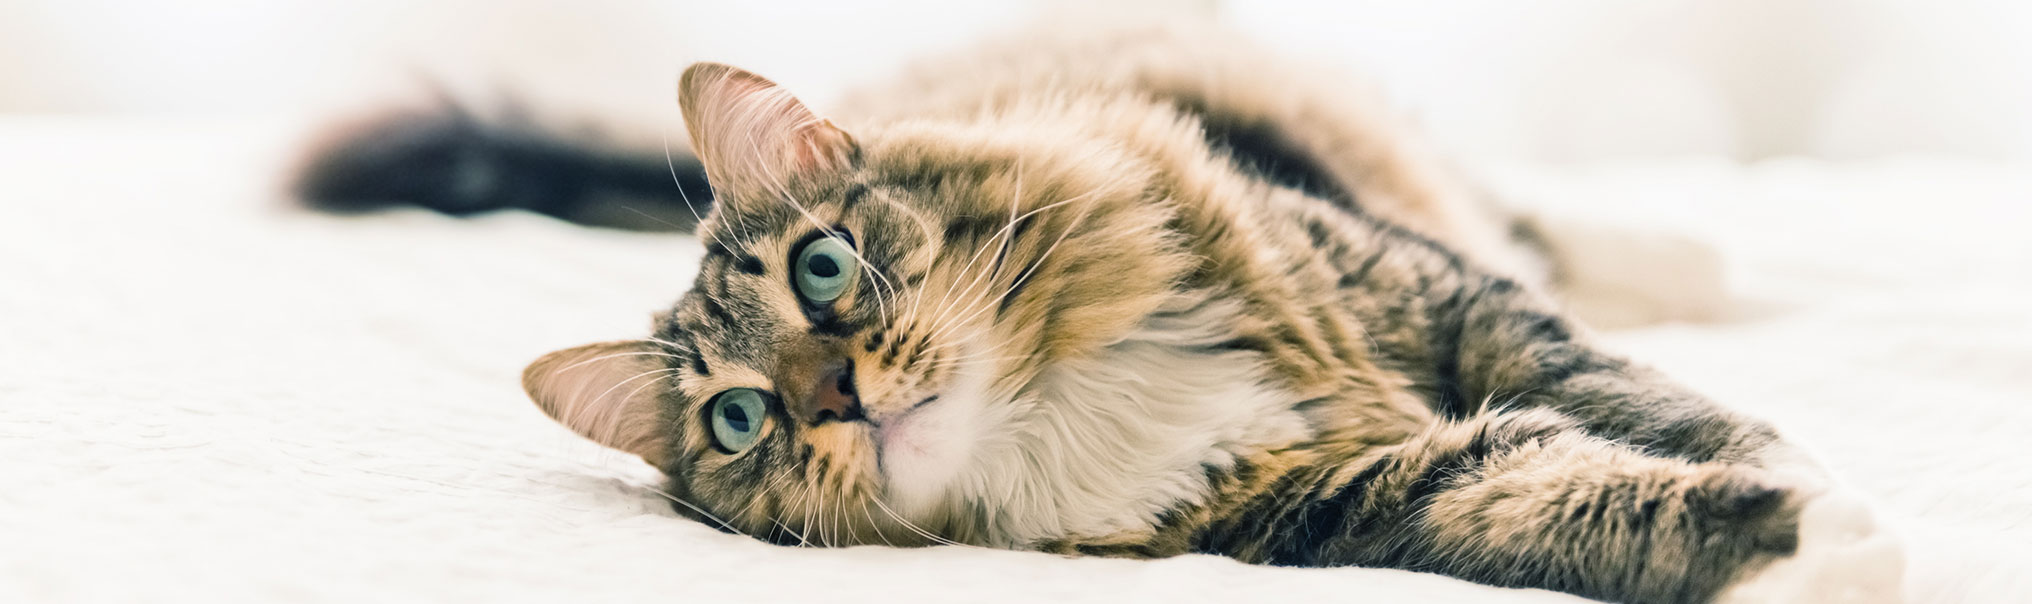 will ferrell cats